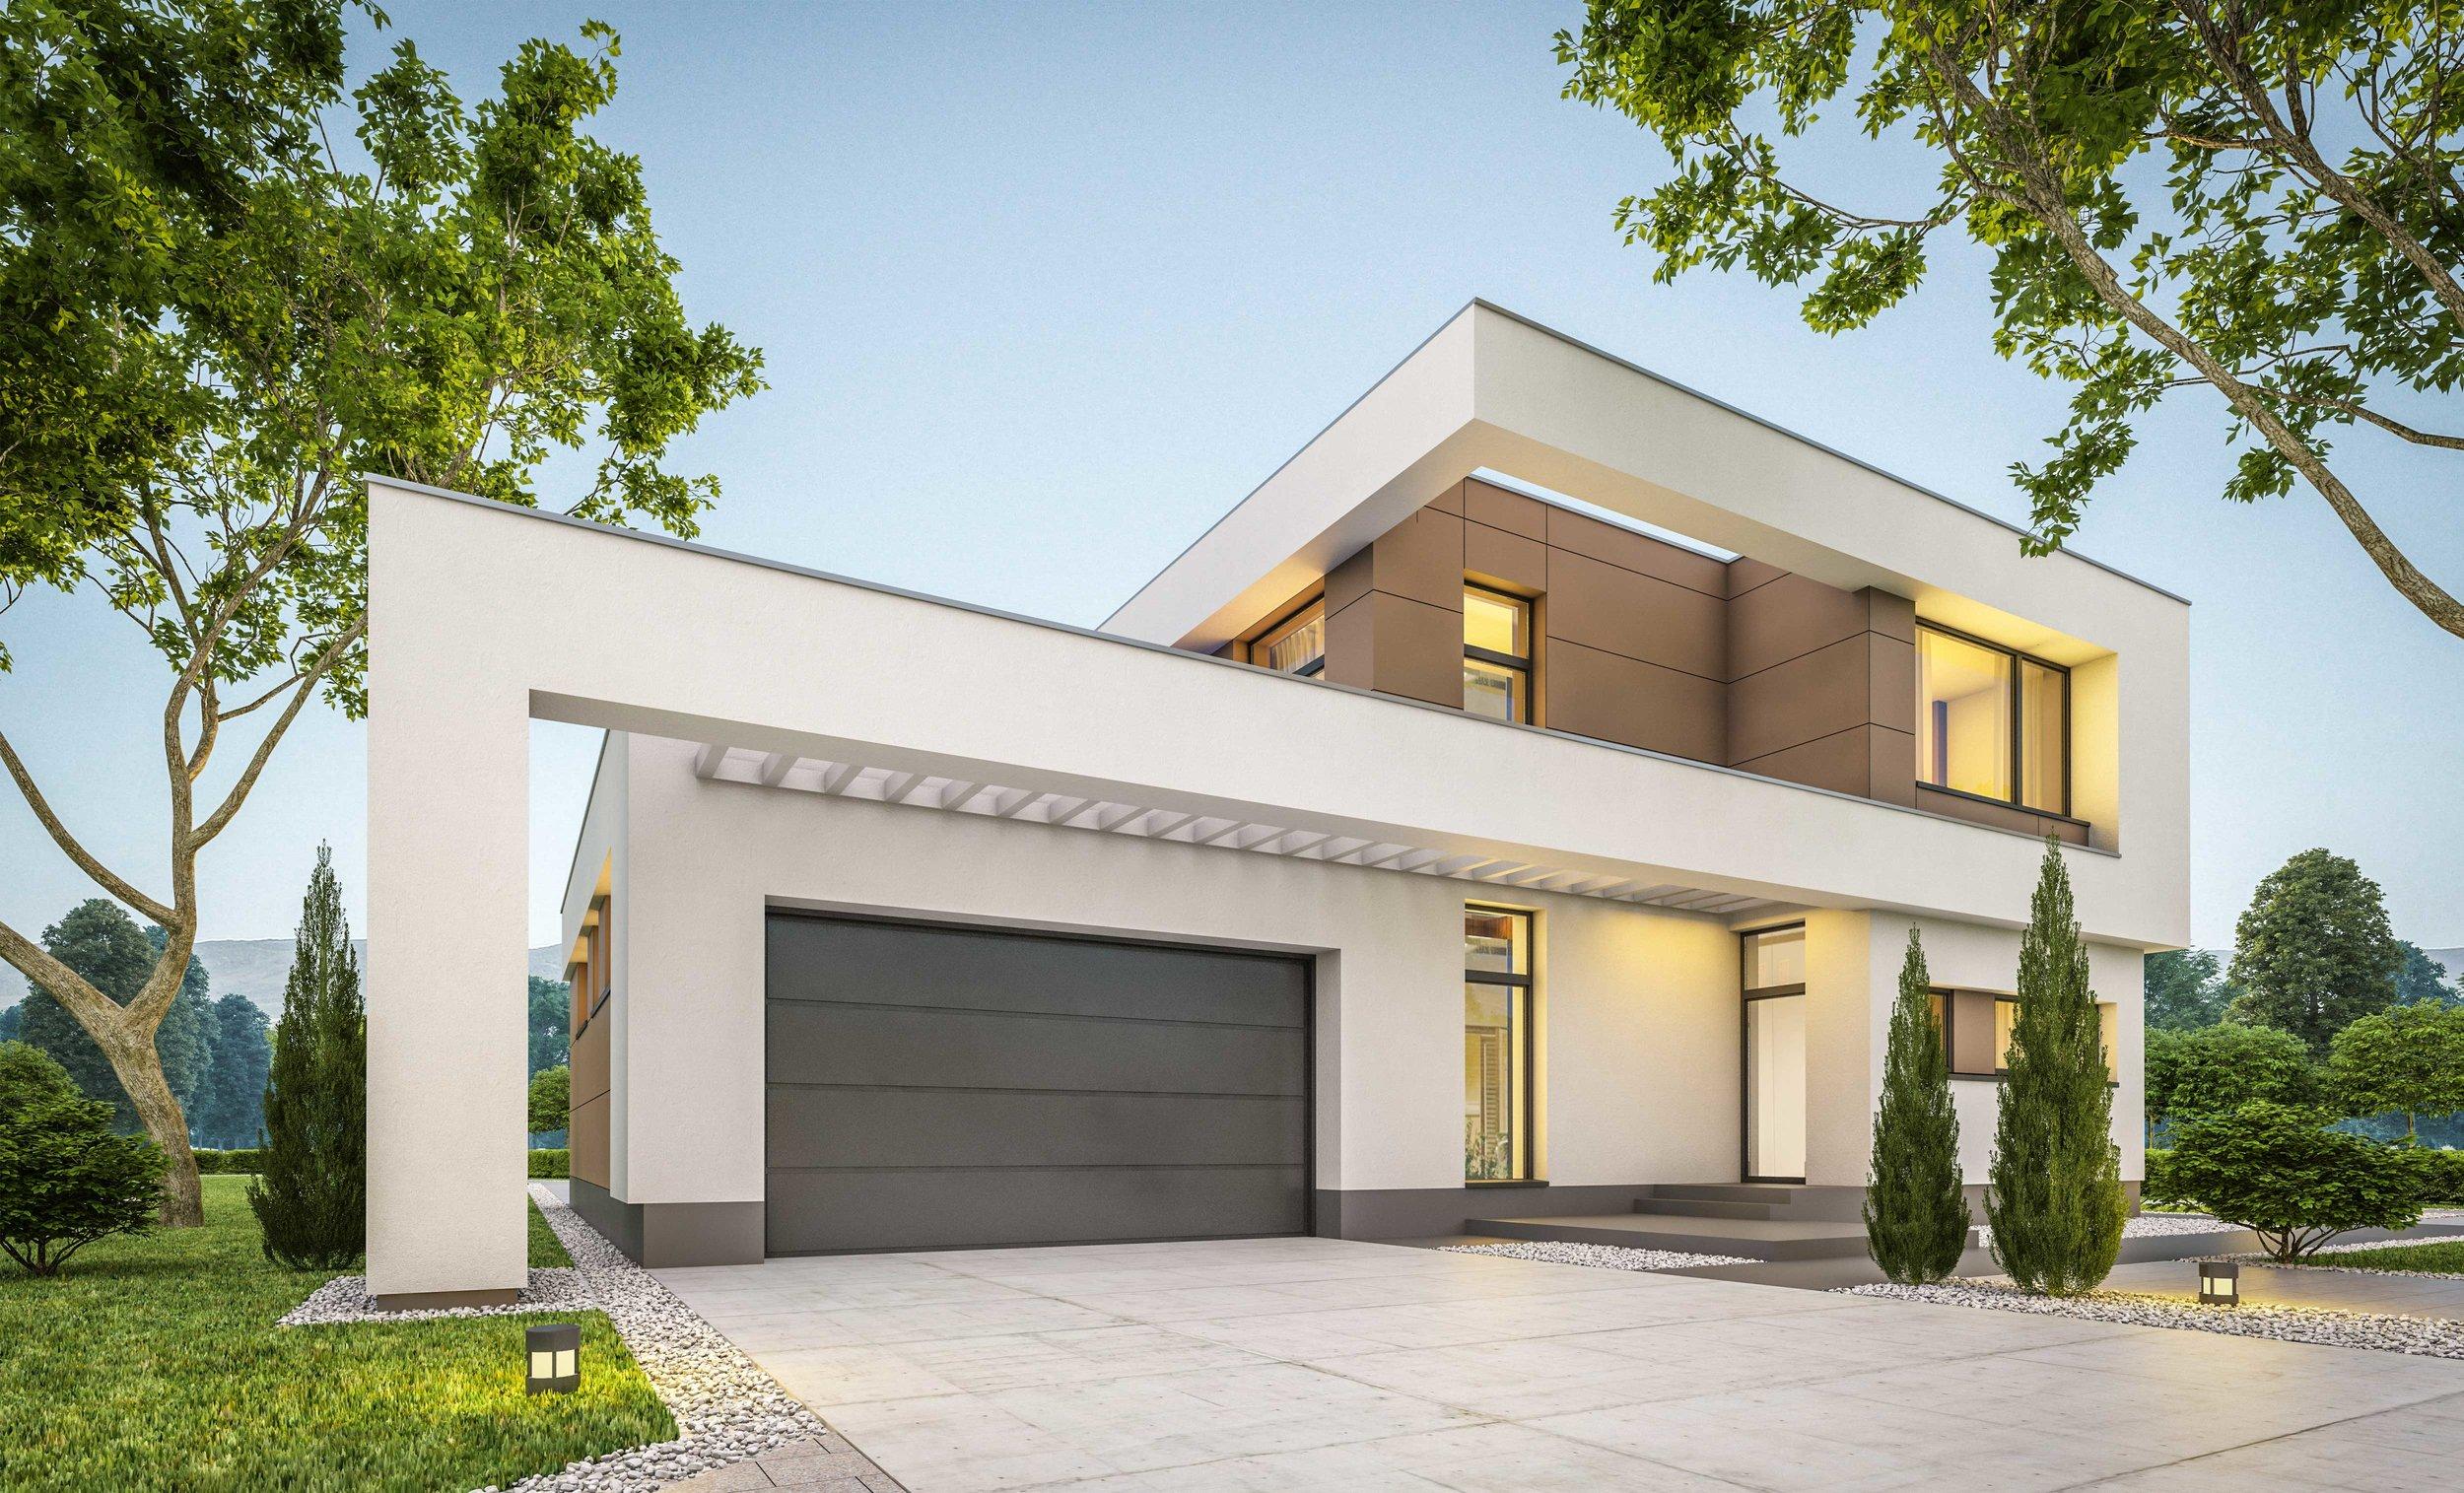 Architectural Style Modern-Art Deco